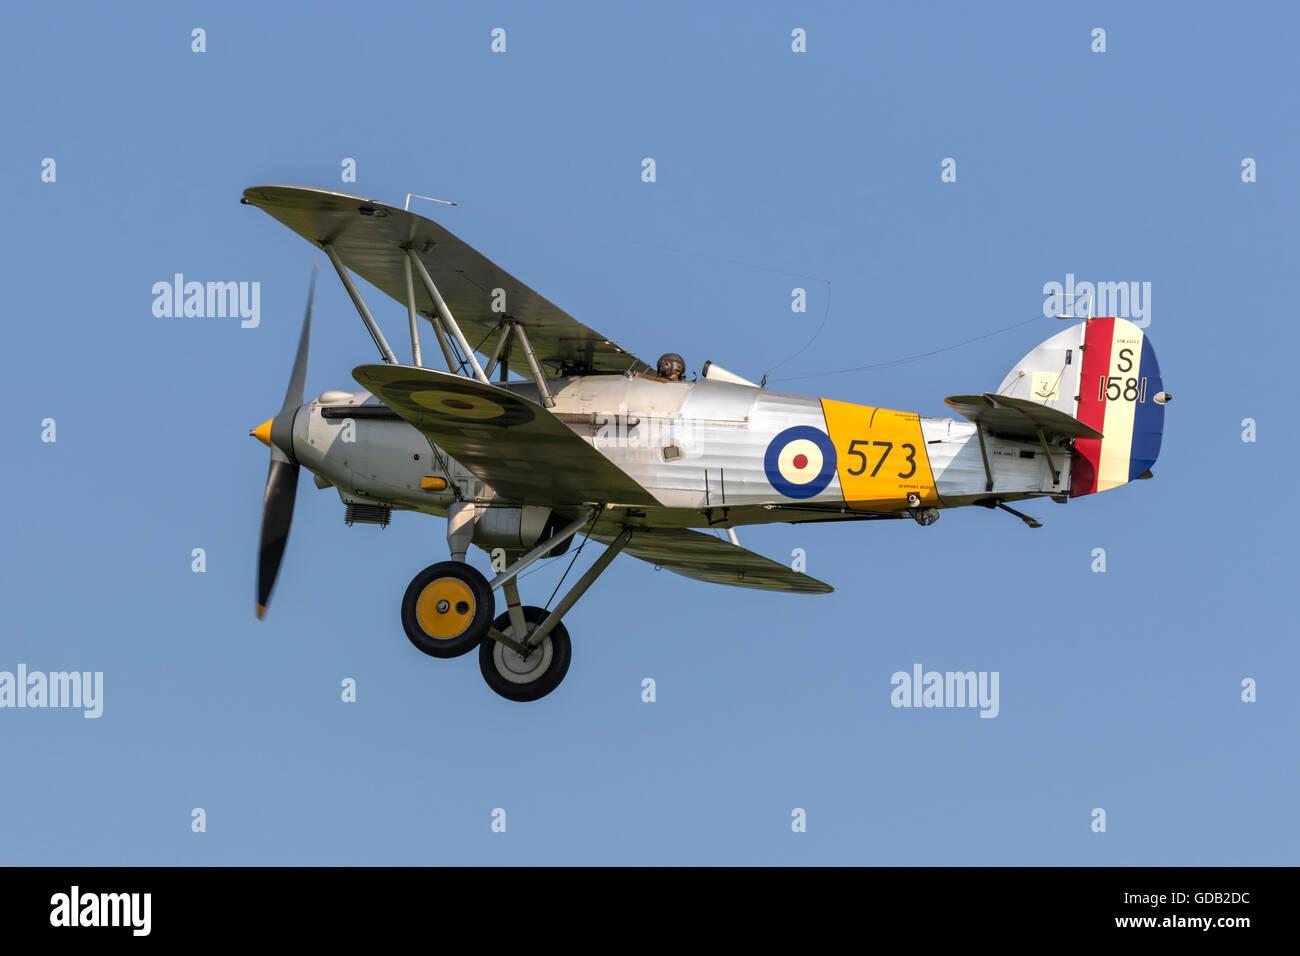 Hawker Nimrod 1 - RAF bi-plane fighter - Stock Image